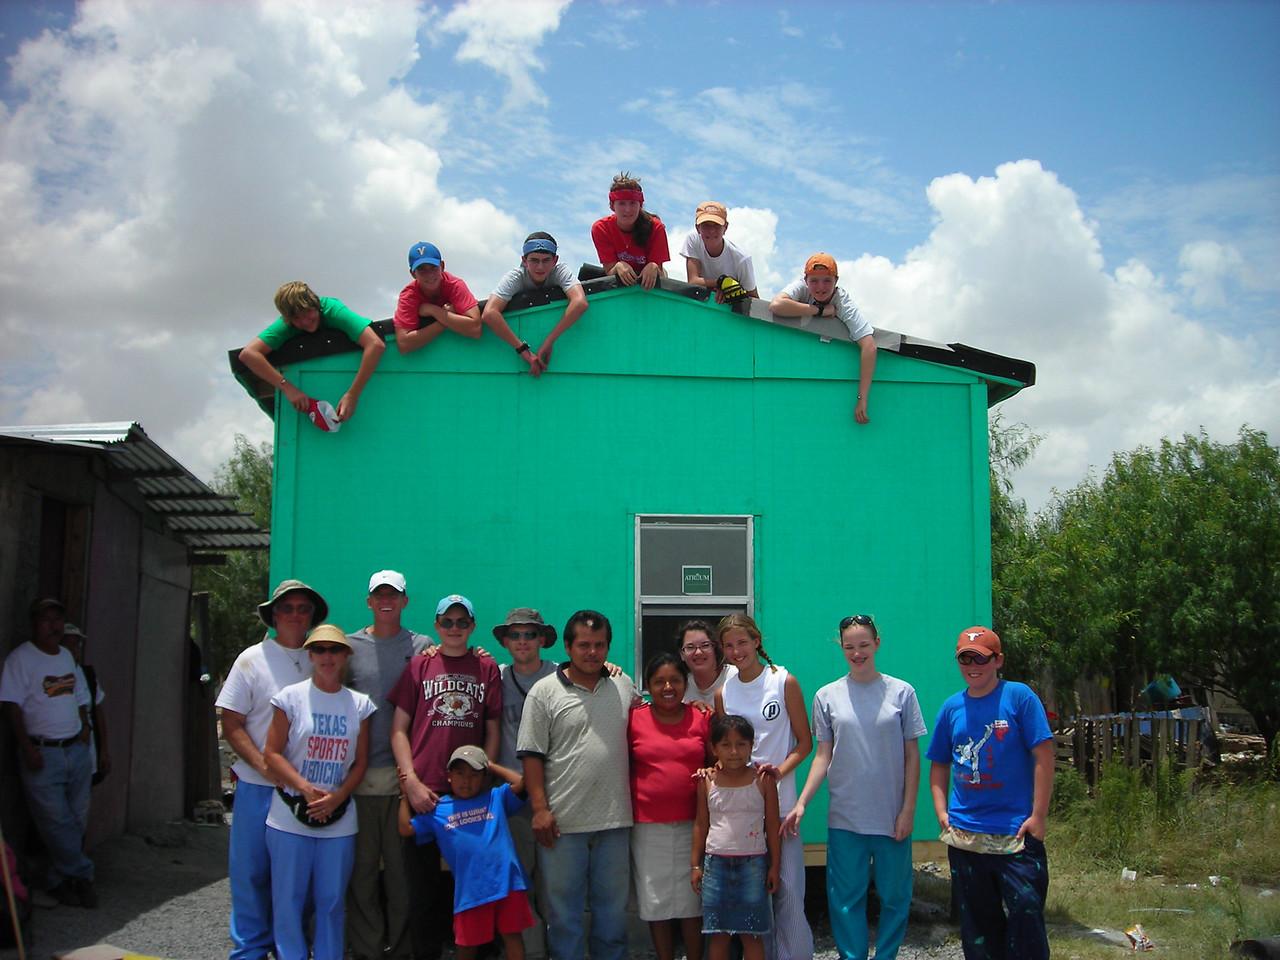 2007-06-21-Mexico-FBCN 011